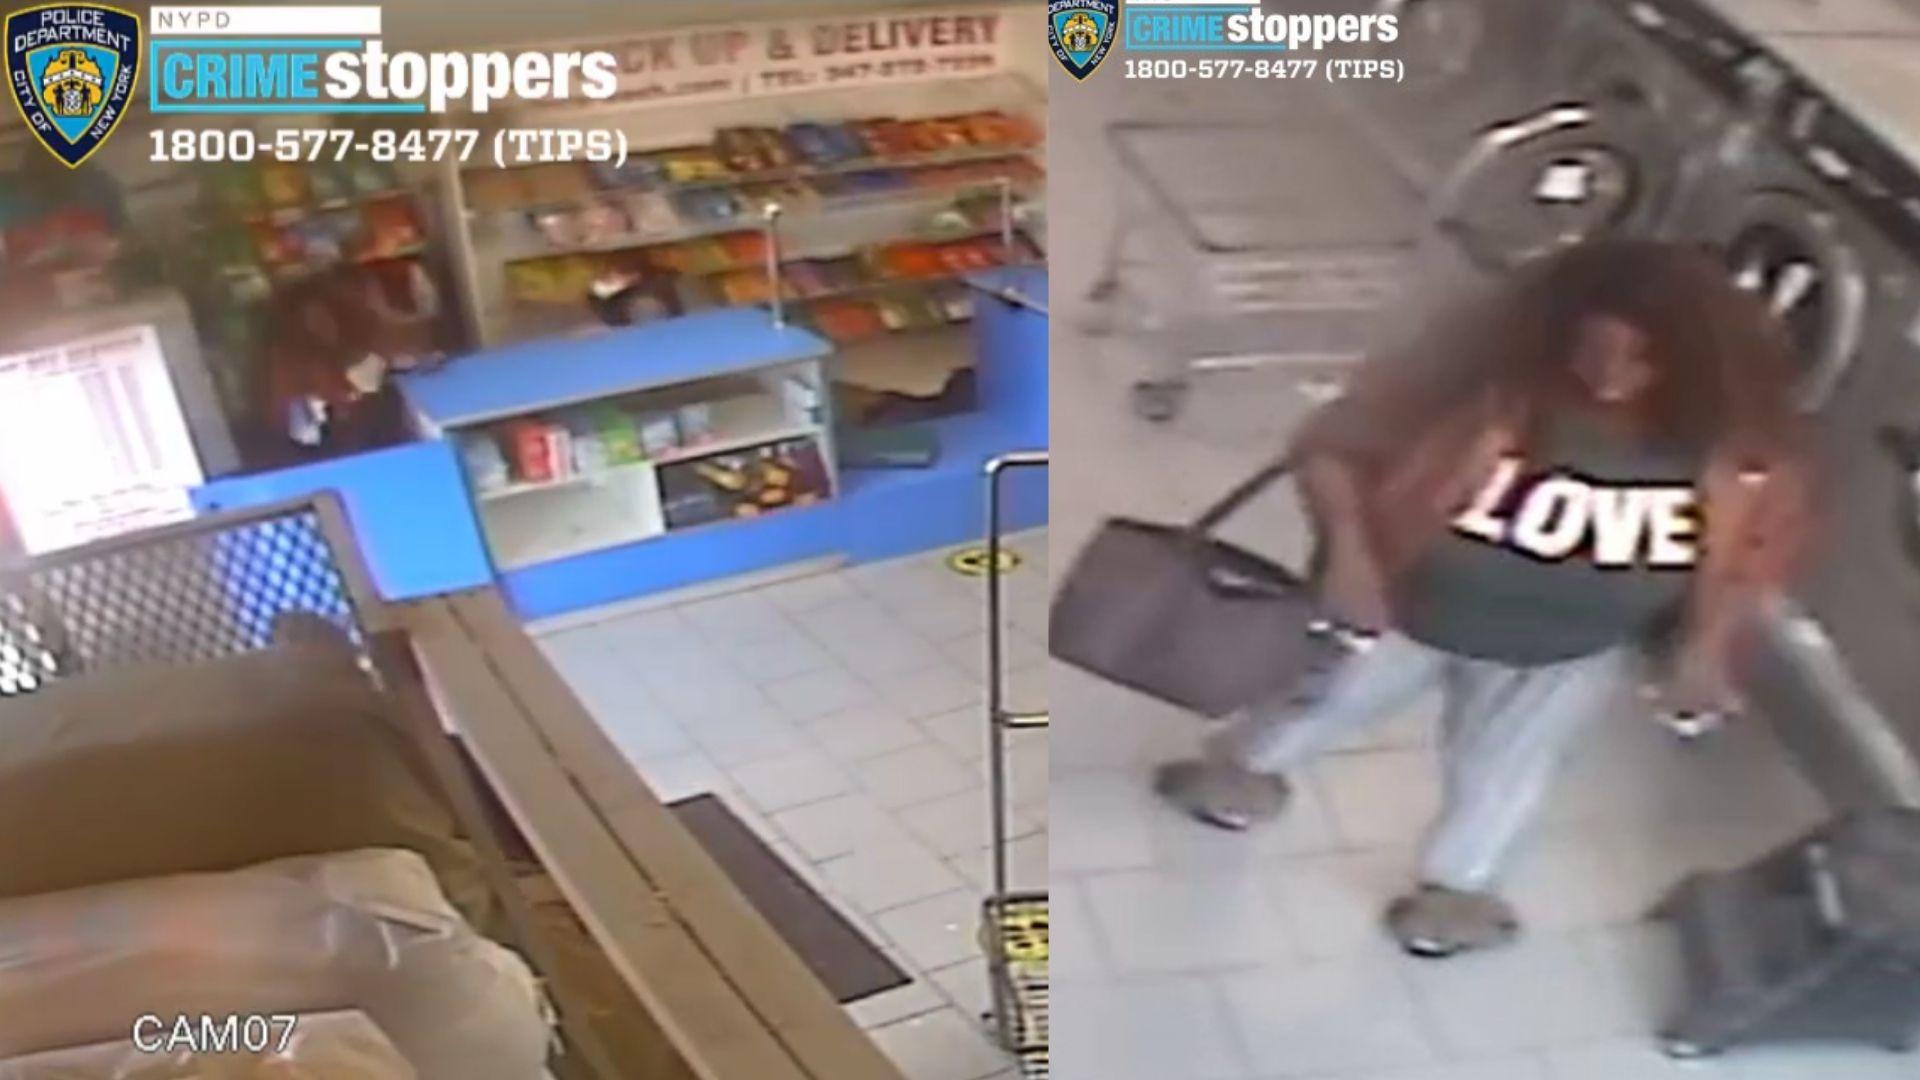 BK laundromat robbery